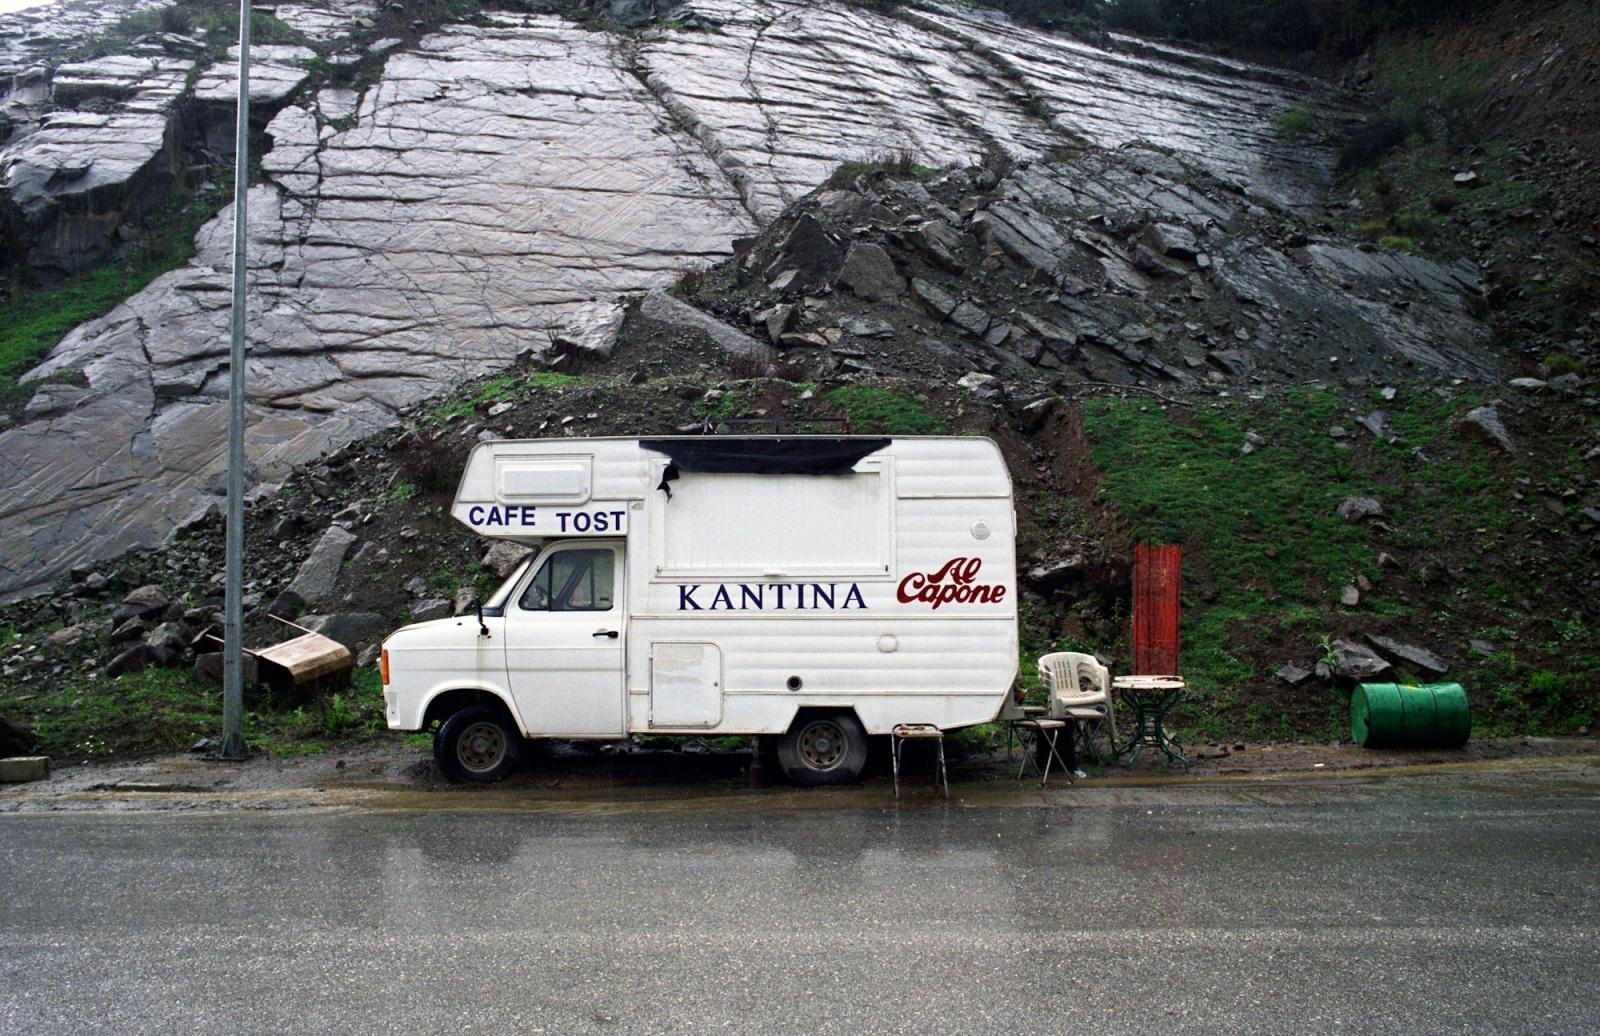 Food truck. Near Lake Kremaston, central Greece.